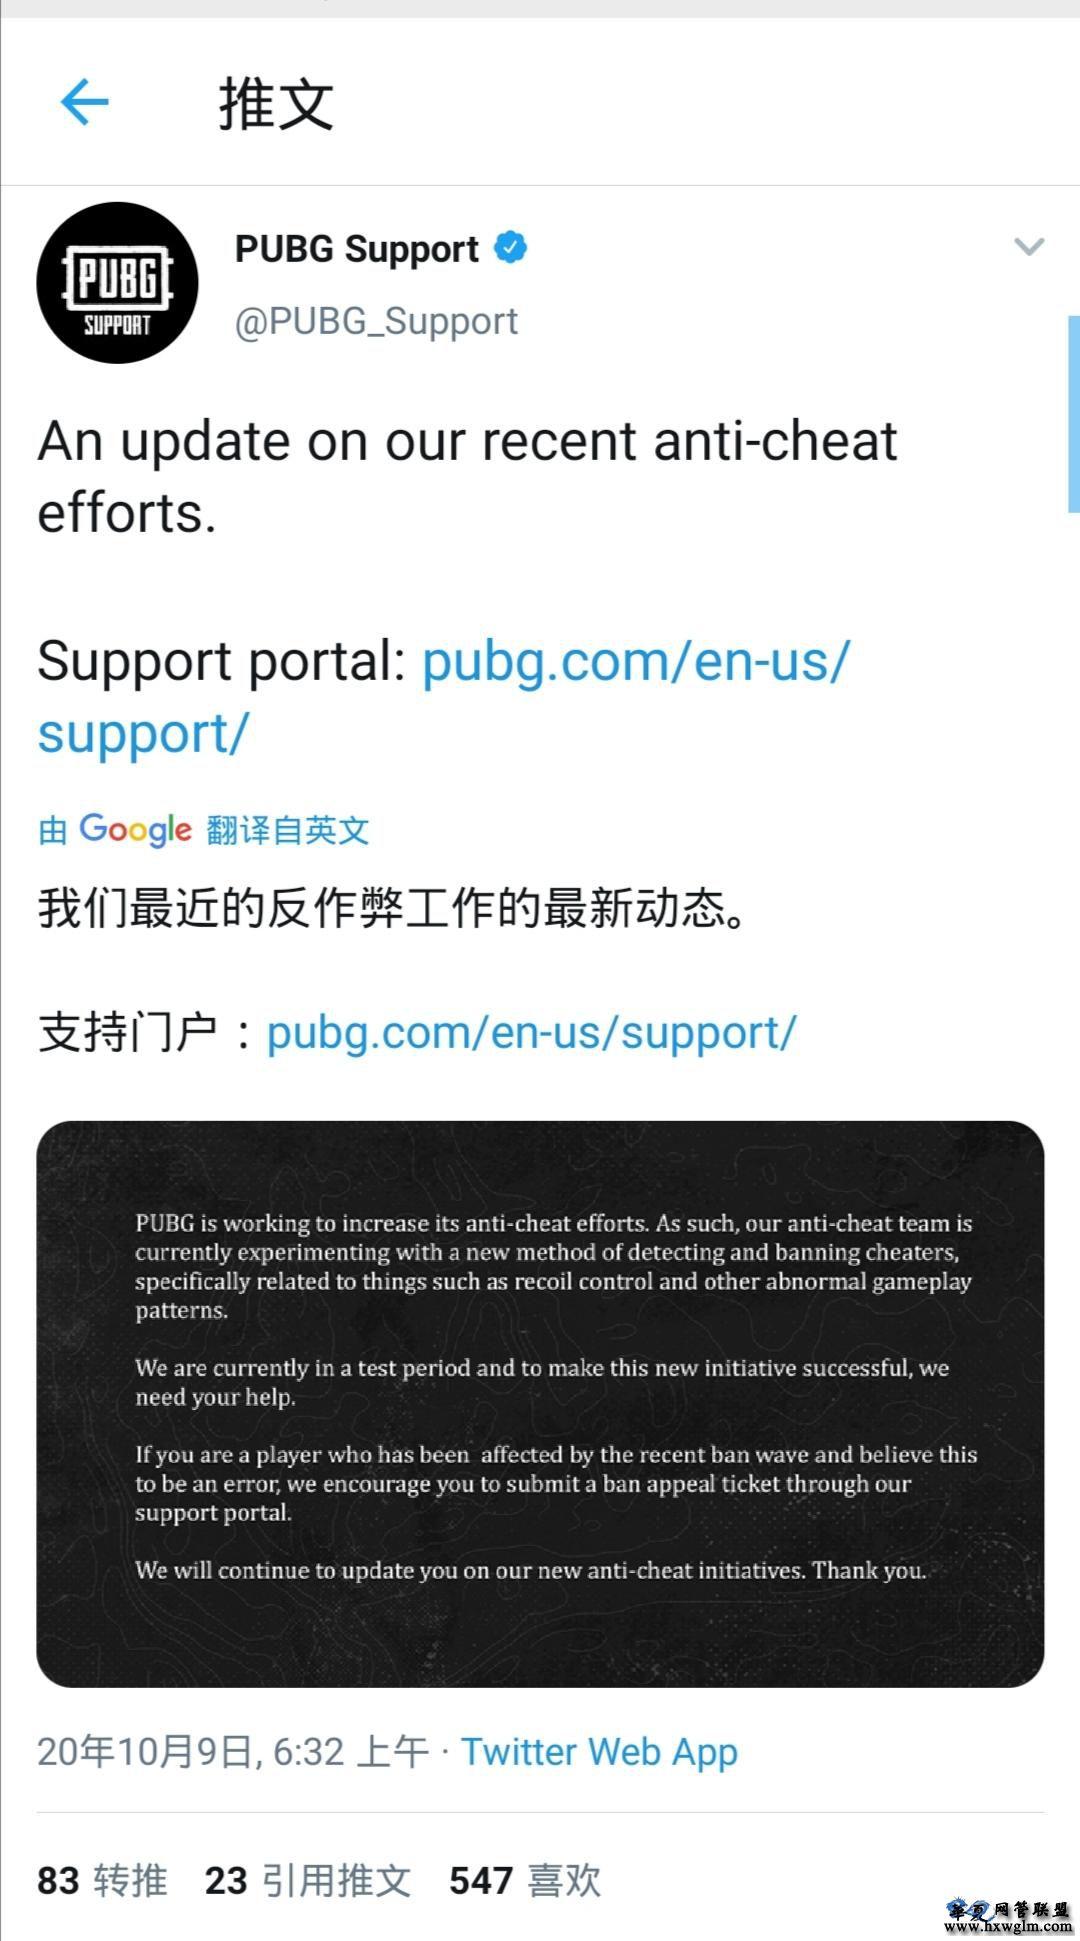 PUBG实施了新的反作弊机制导致近期大量账号被封禁